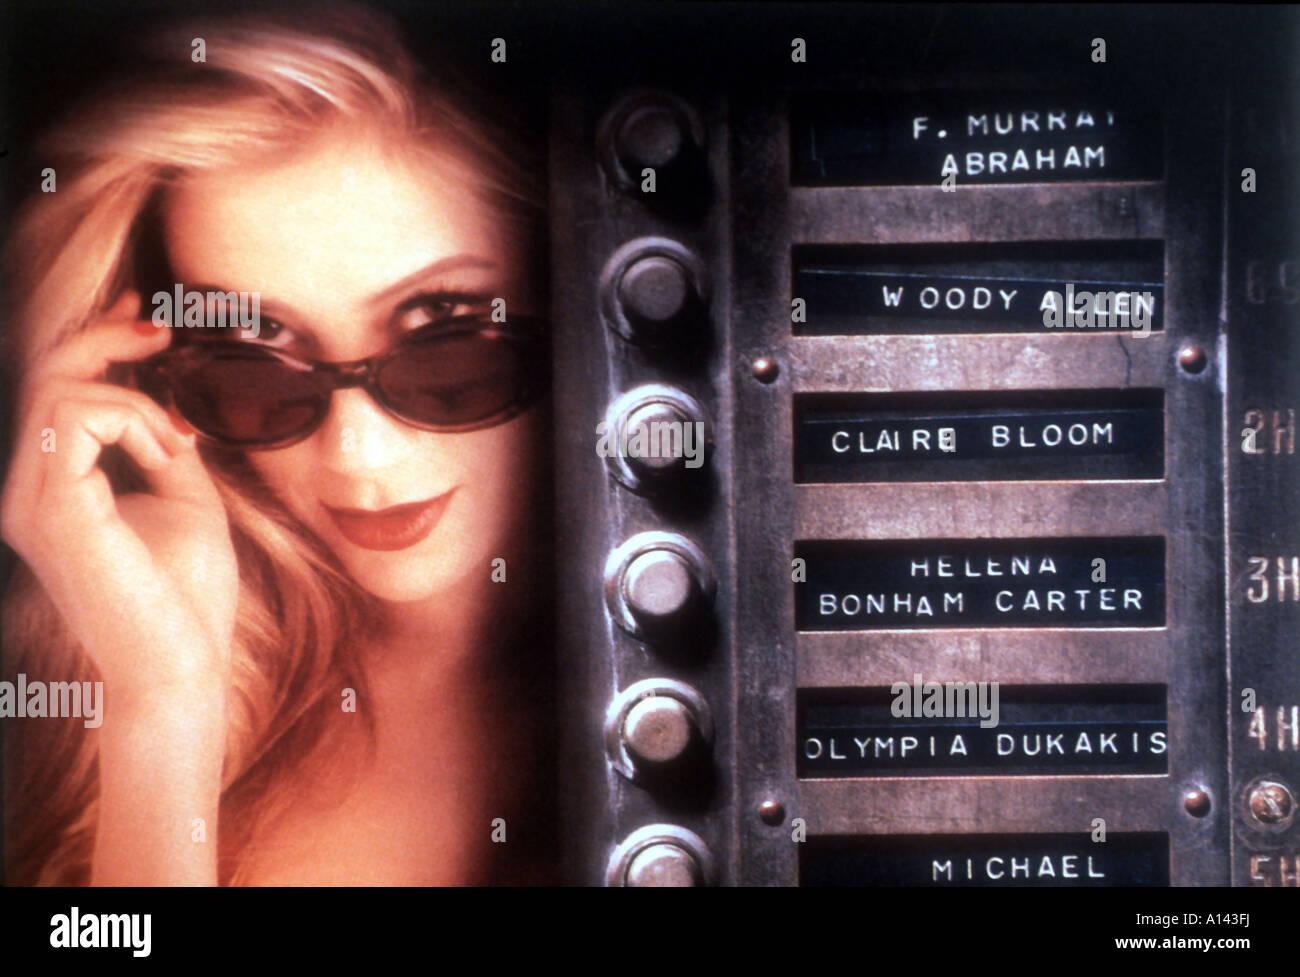 Mighty Aphrodite Year 1995 Director Woody Allen Mira Sorvino - Stock Image